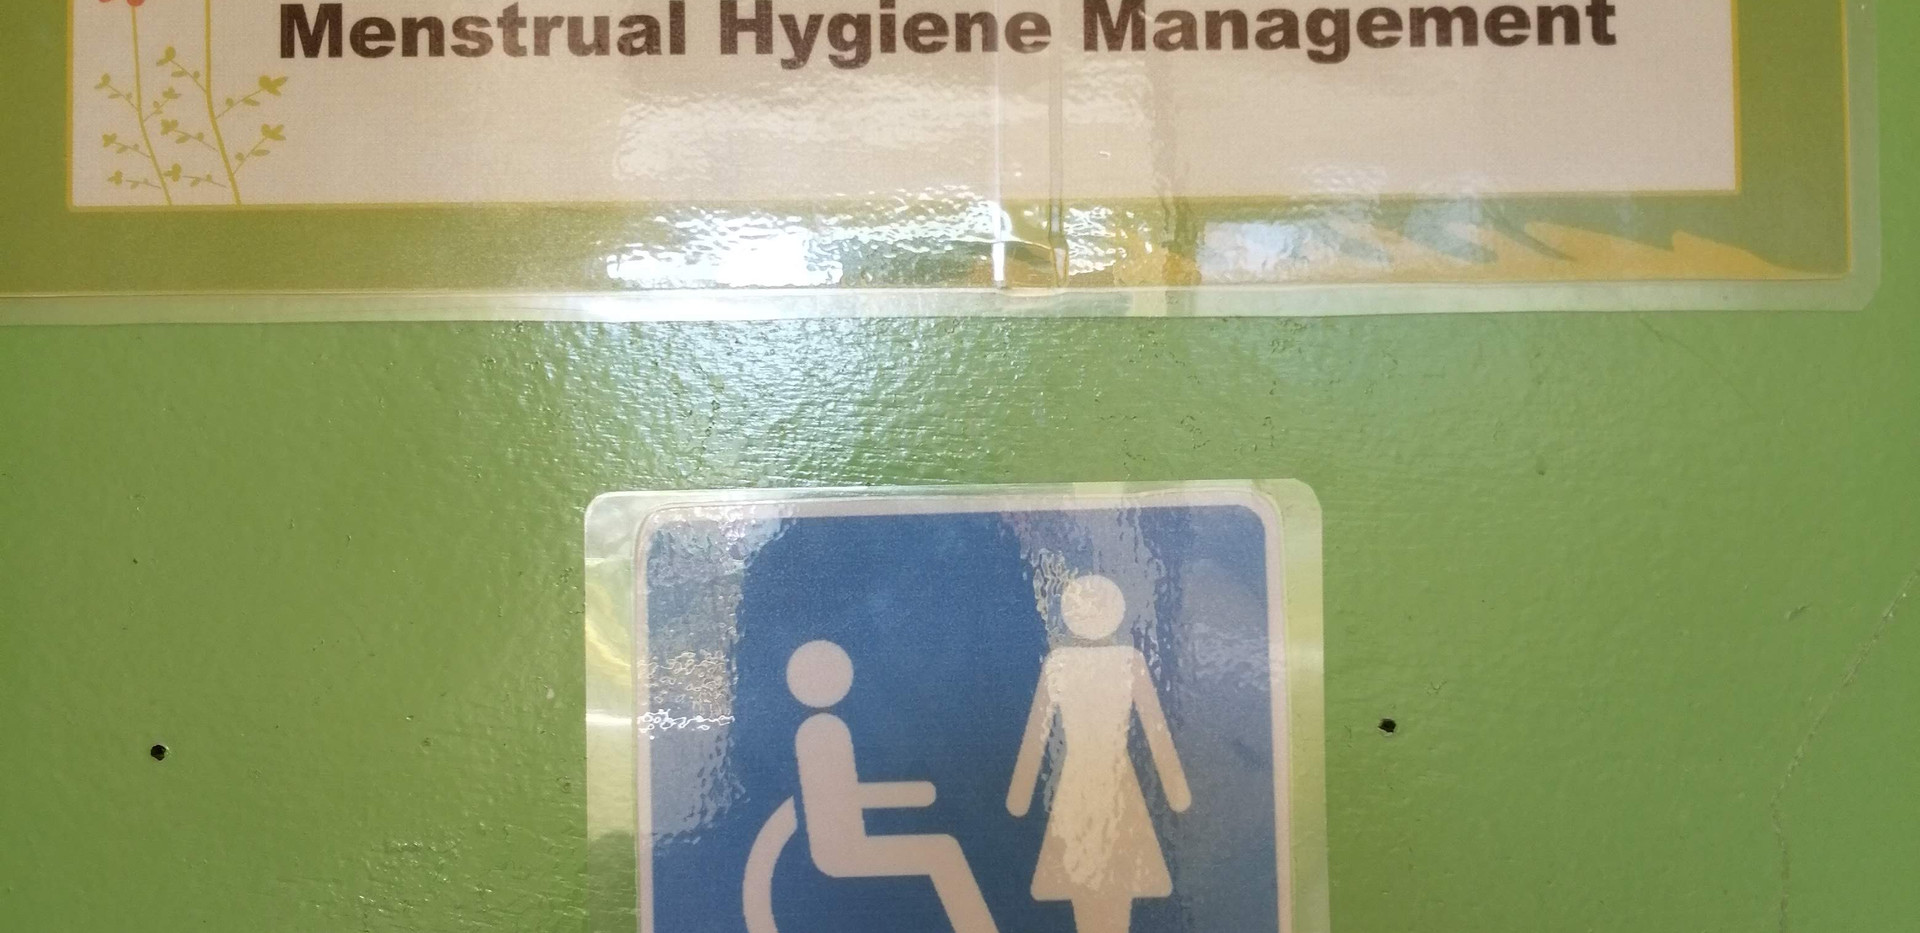 Menstrual Hygiene Management Toilet